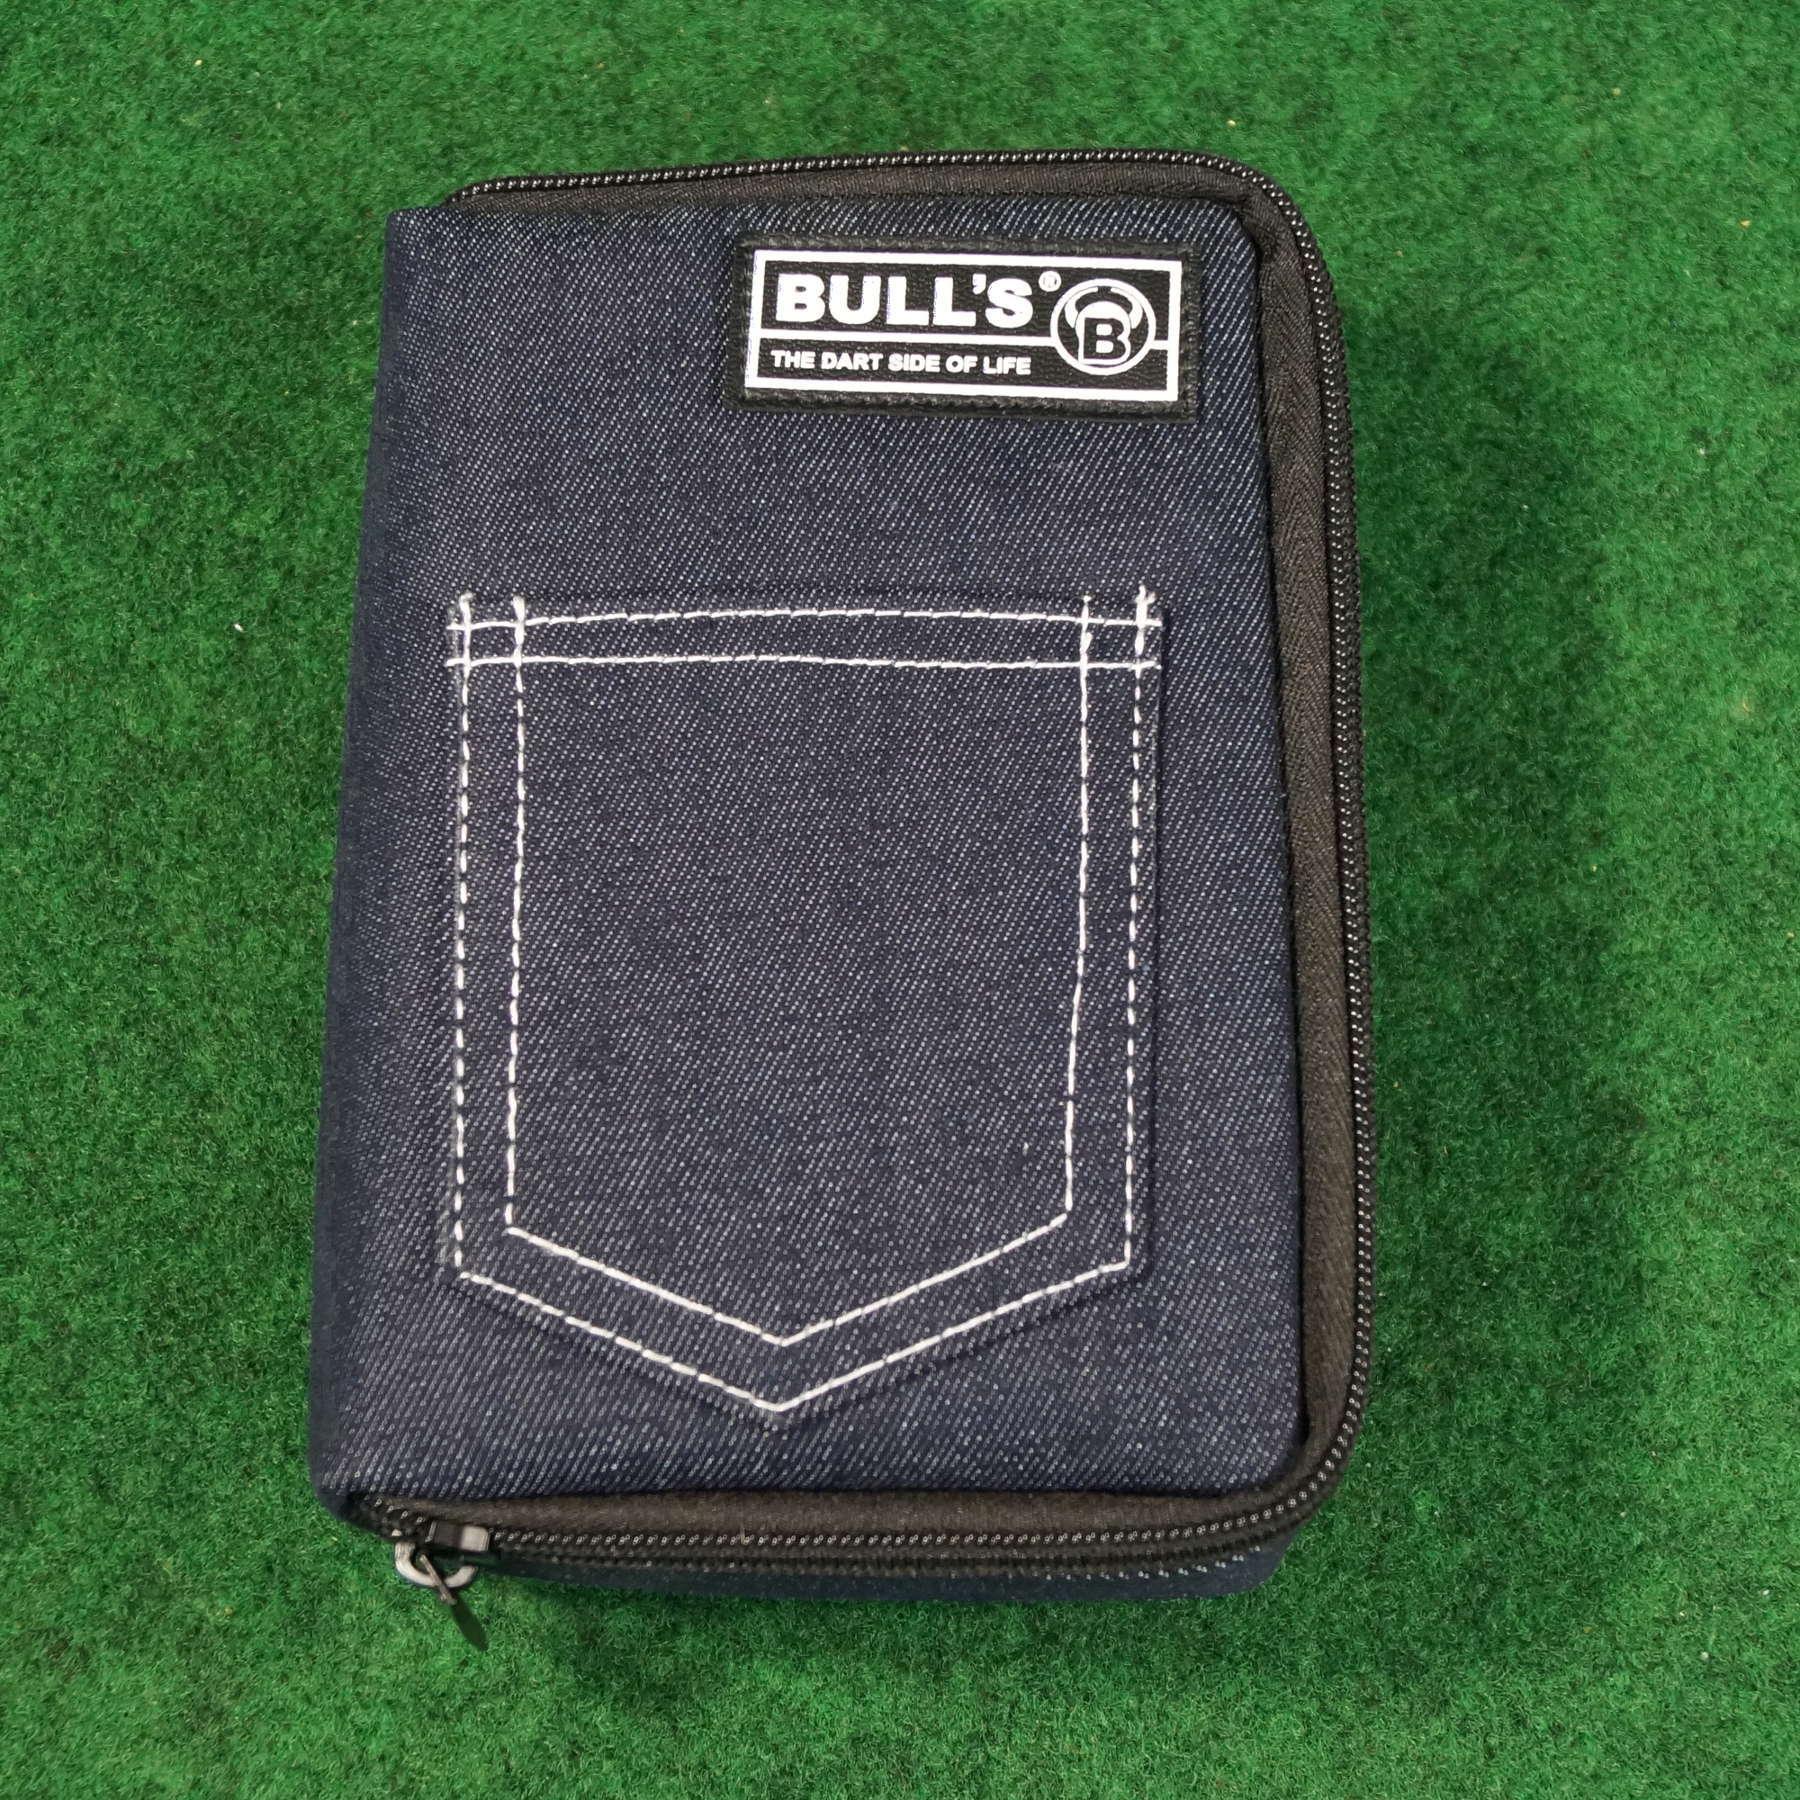 Bull's Darttasche Jeans